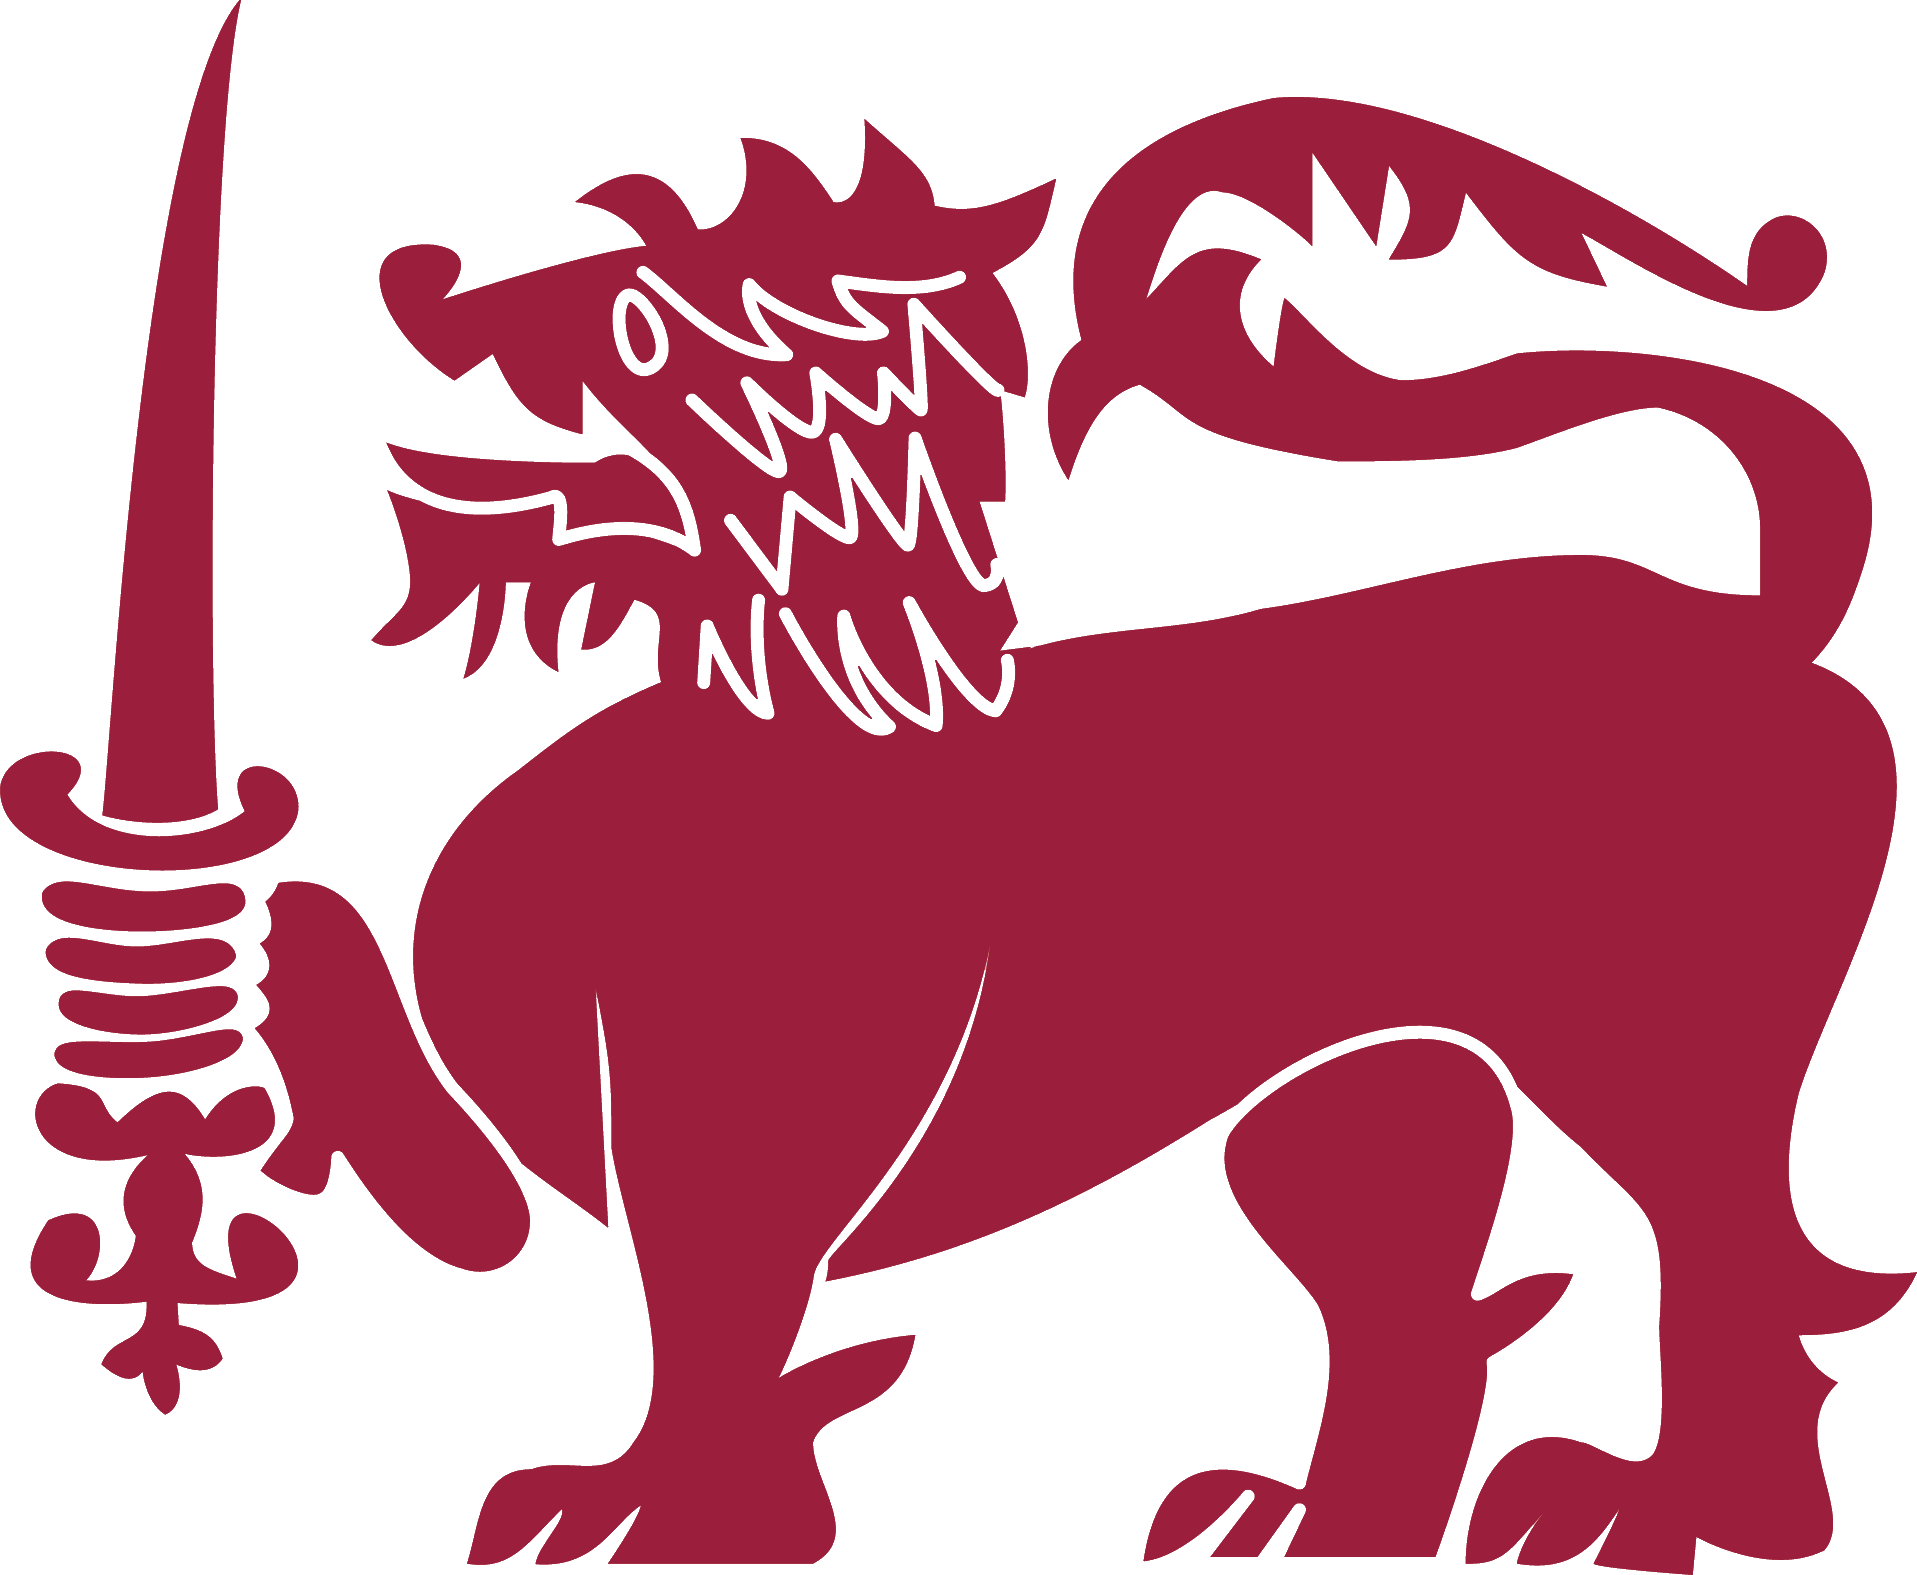 Resultado de imagen para Sri Lanka png